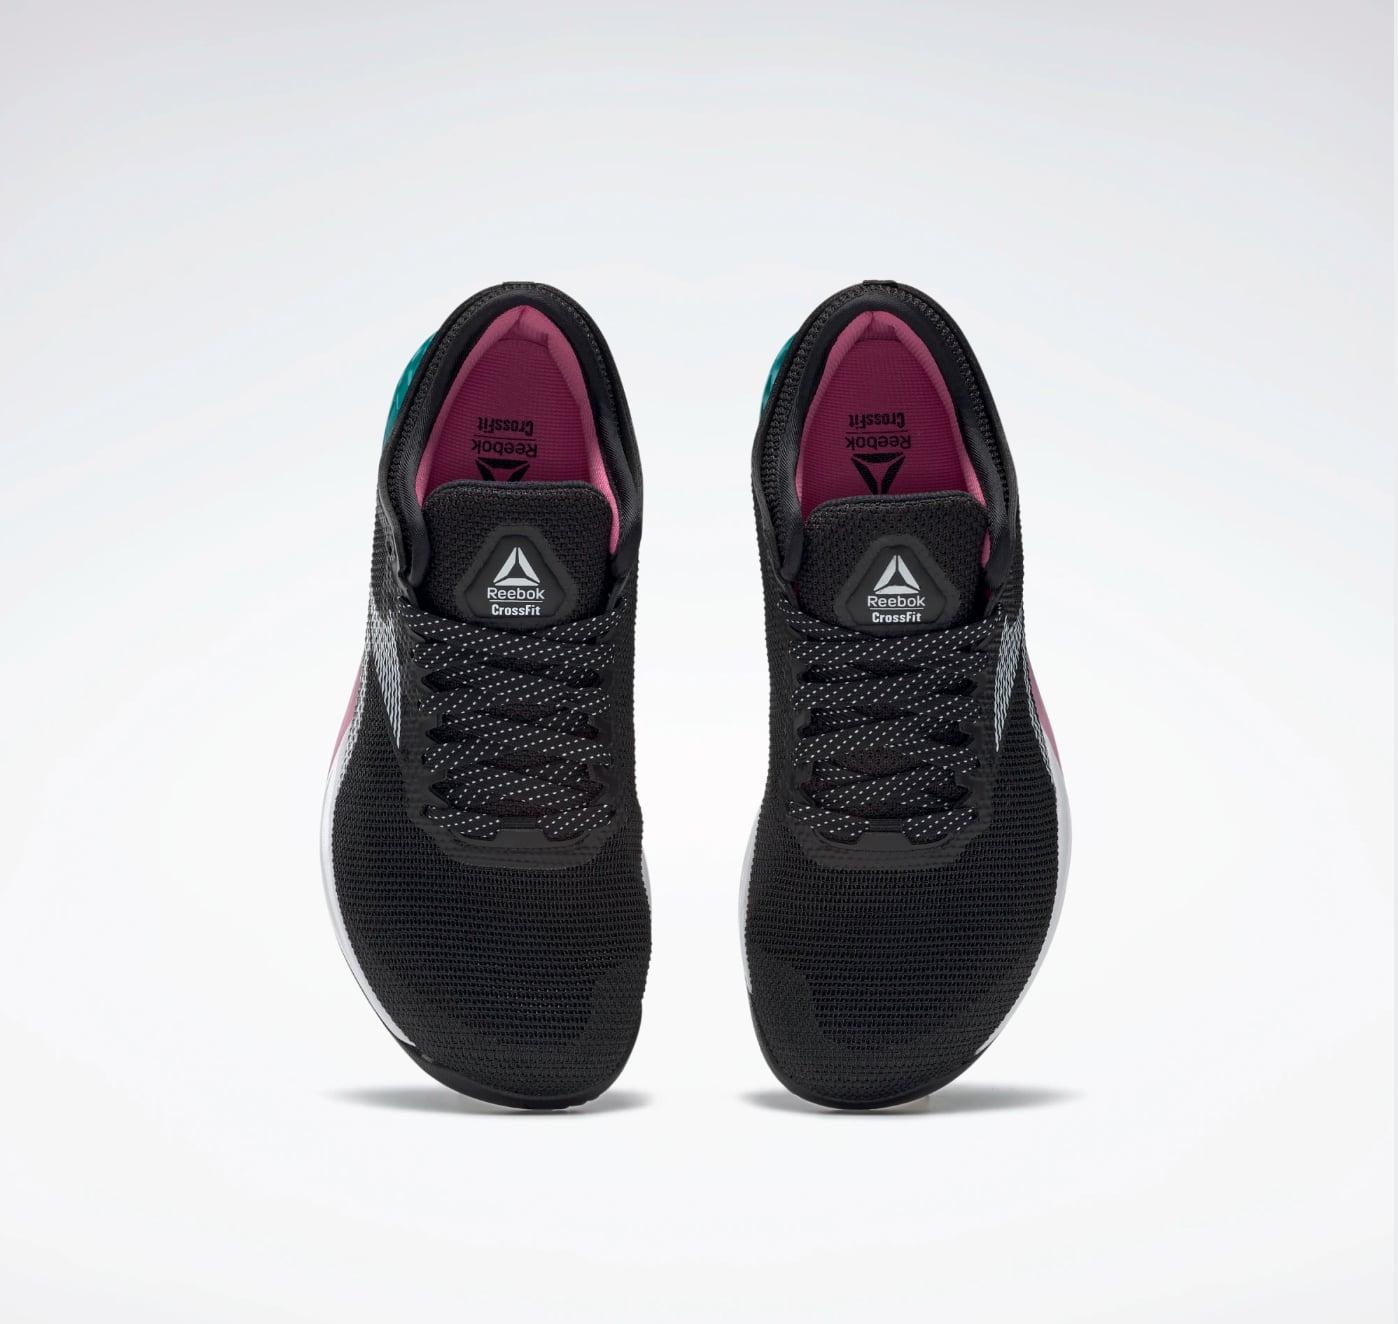 Reebok Nano 9 Sneaker Review For CrossFit | POPSUGAR